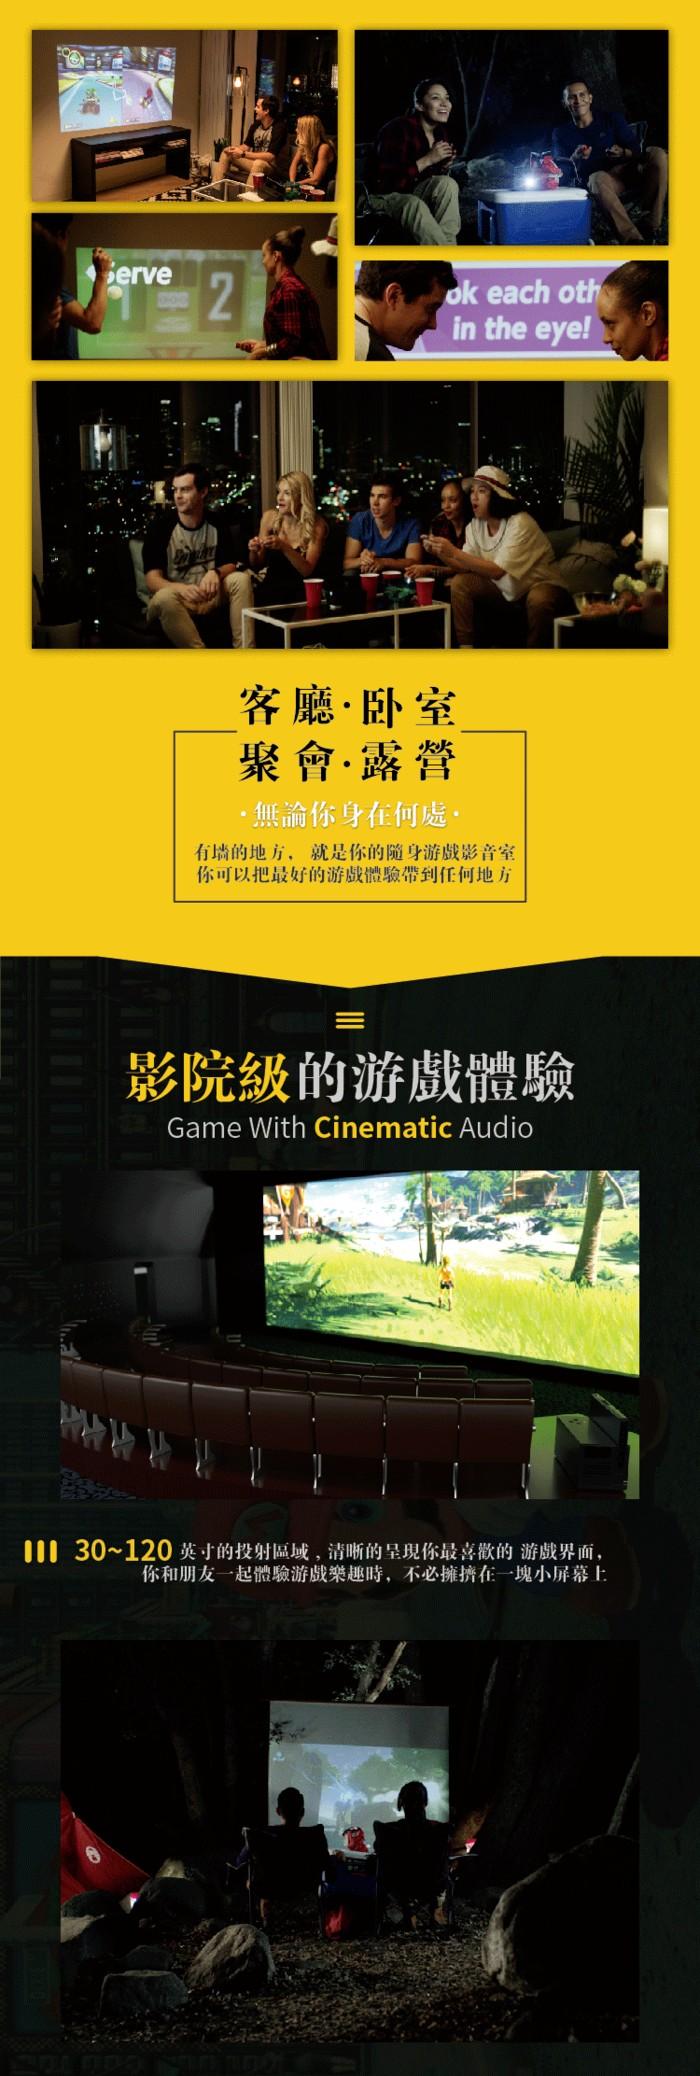 OJO 首部Switch 專屬高清投影機_香港_台灣